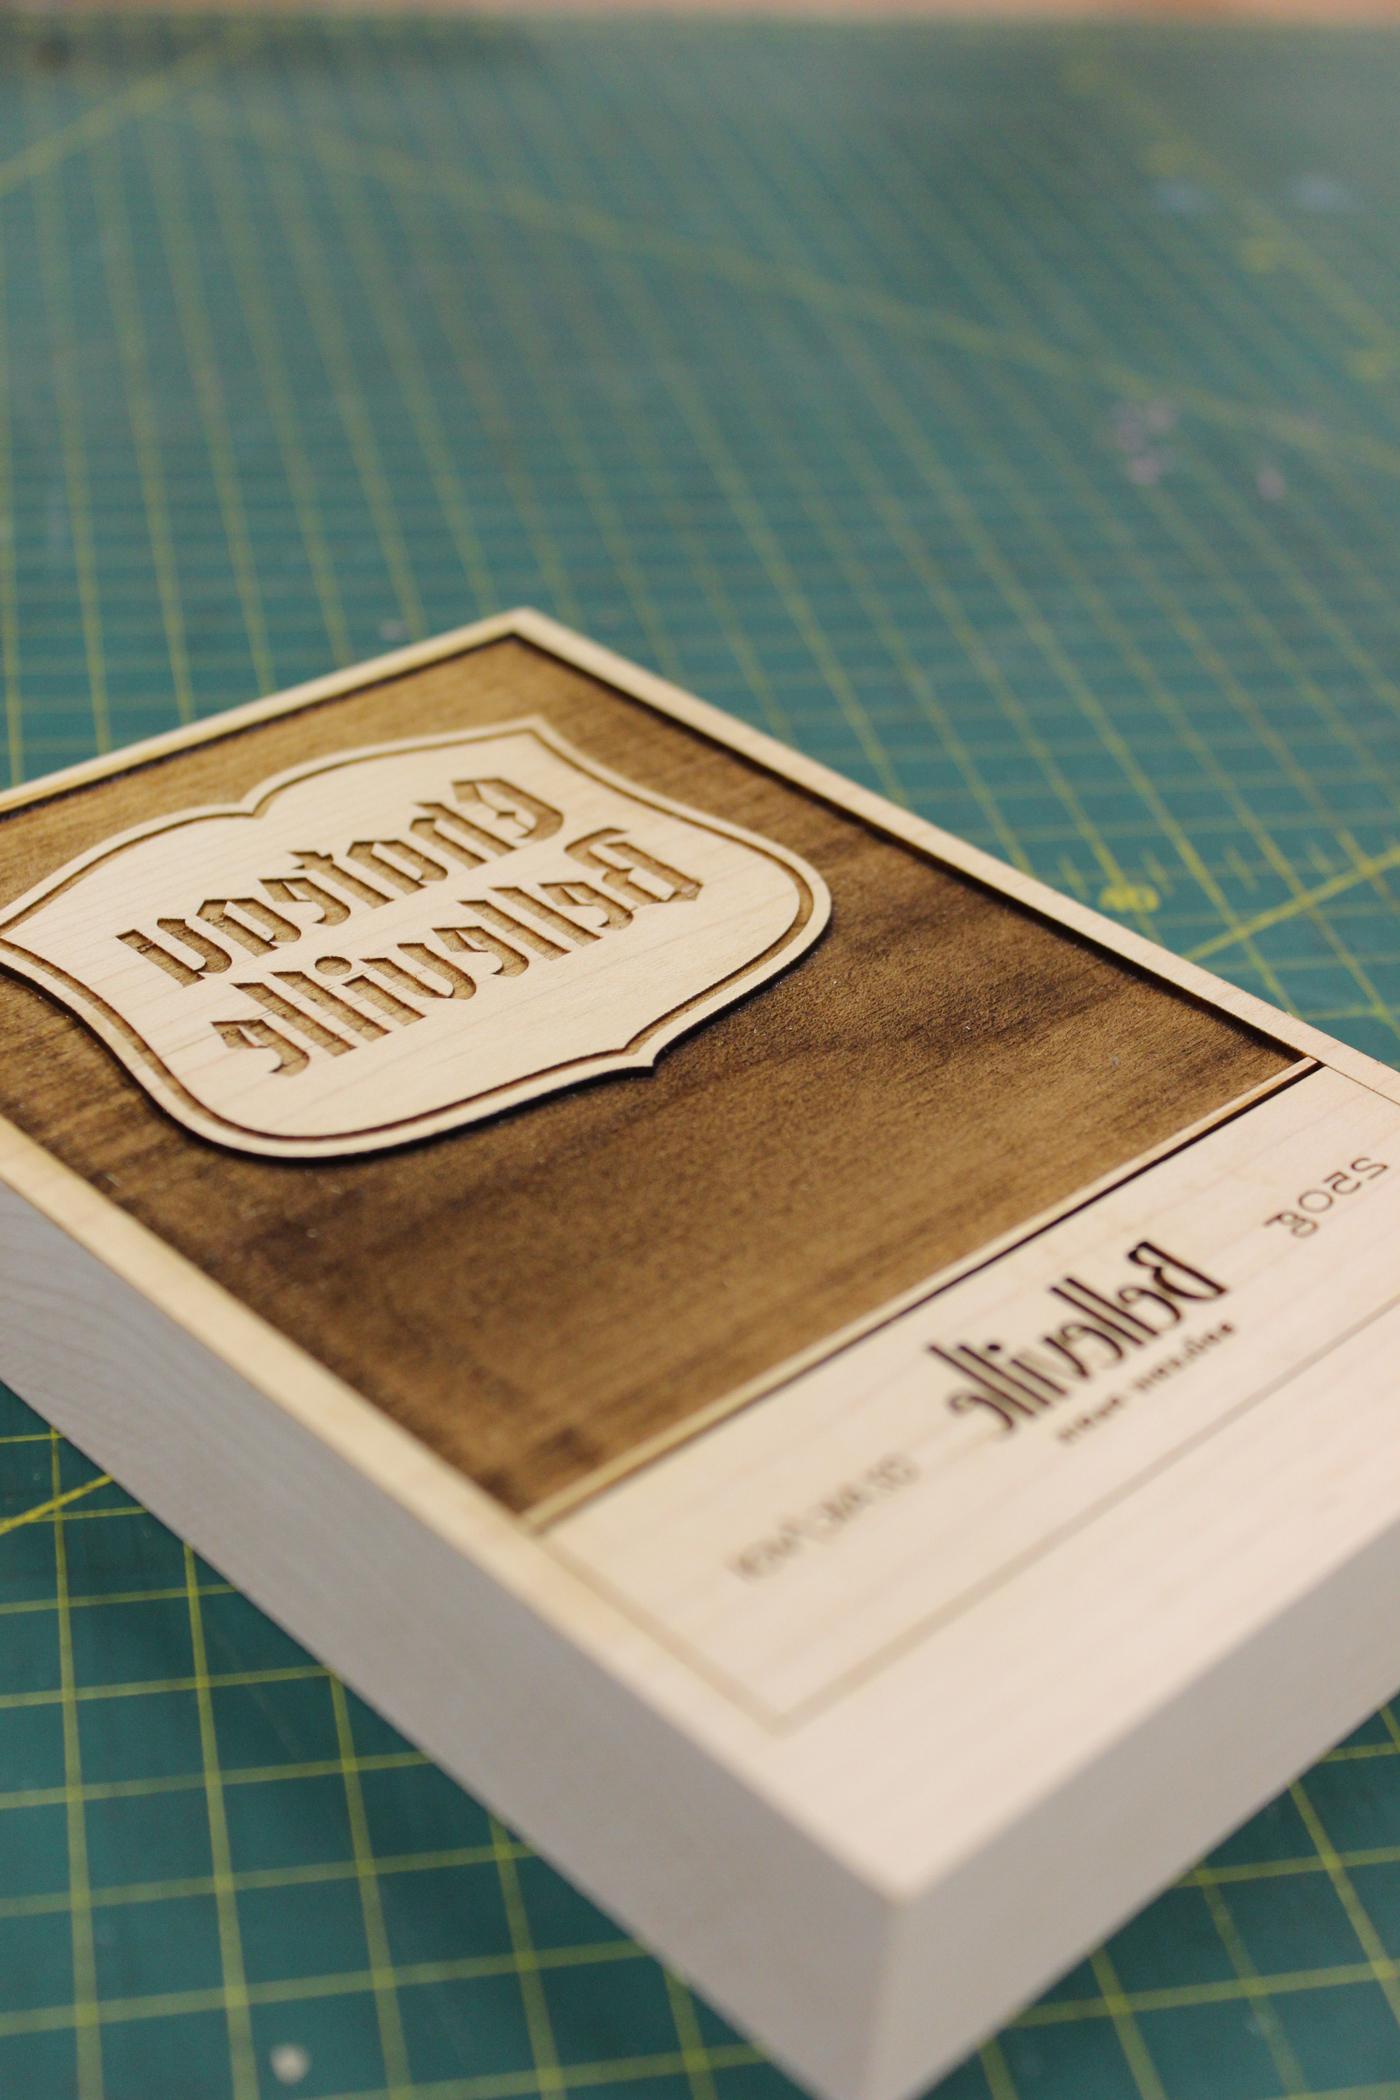 handcraft-series-thomas-mayo-goodfromyou-1.jpg